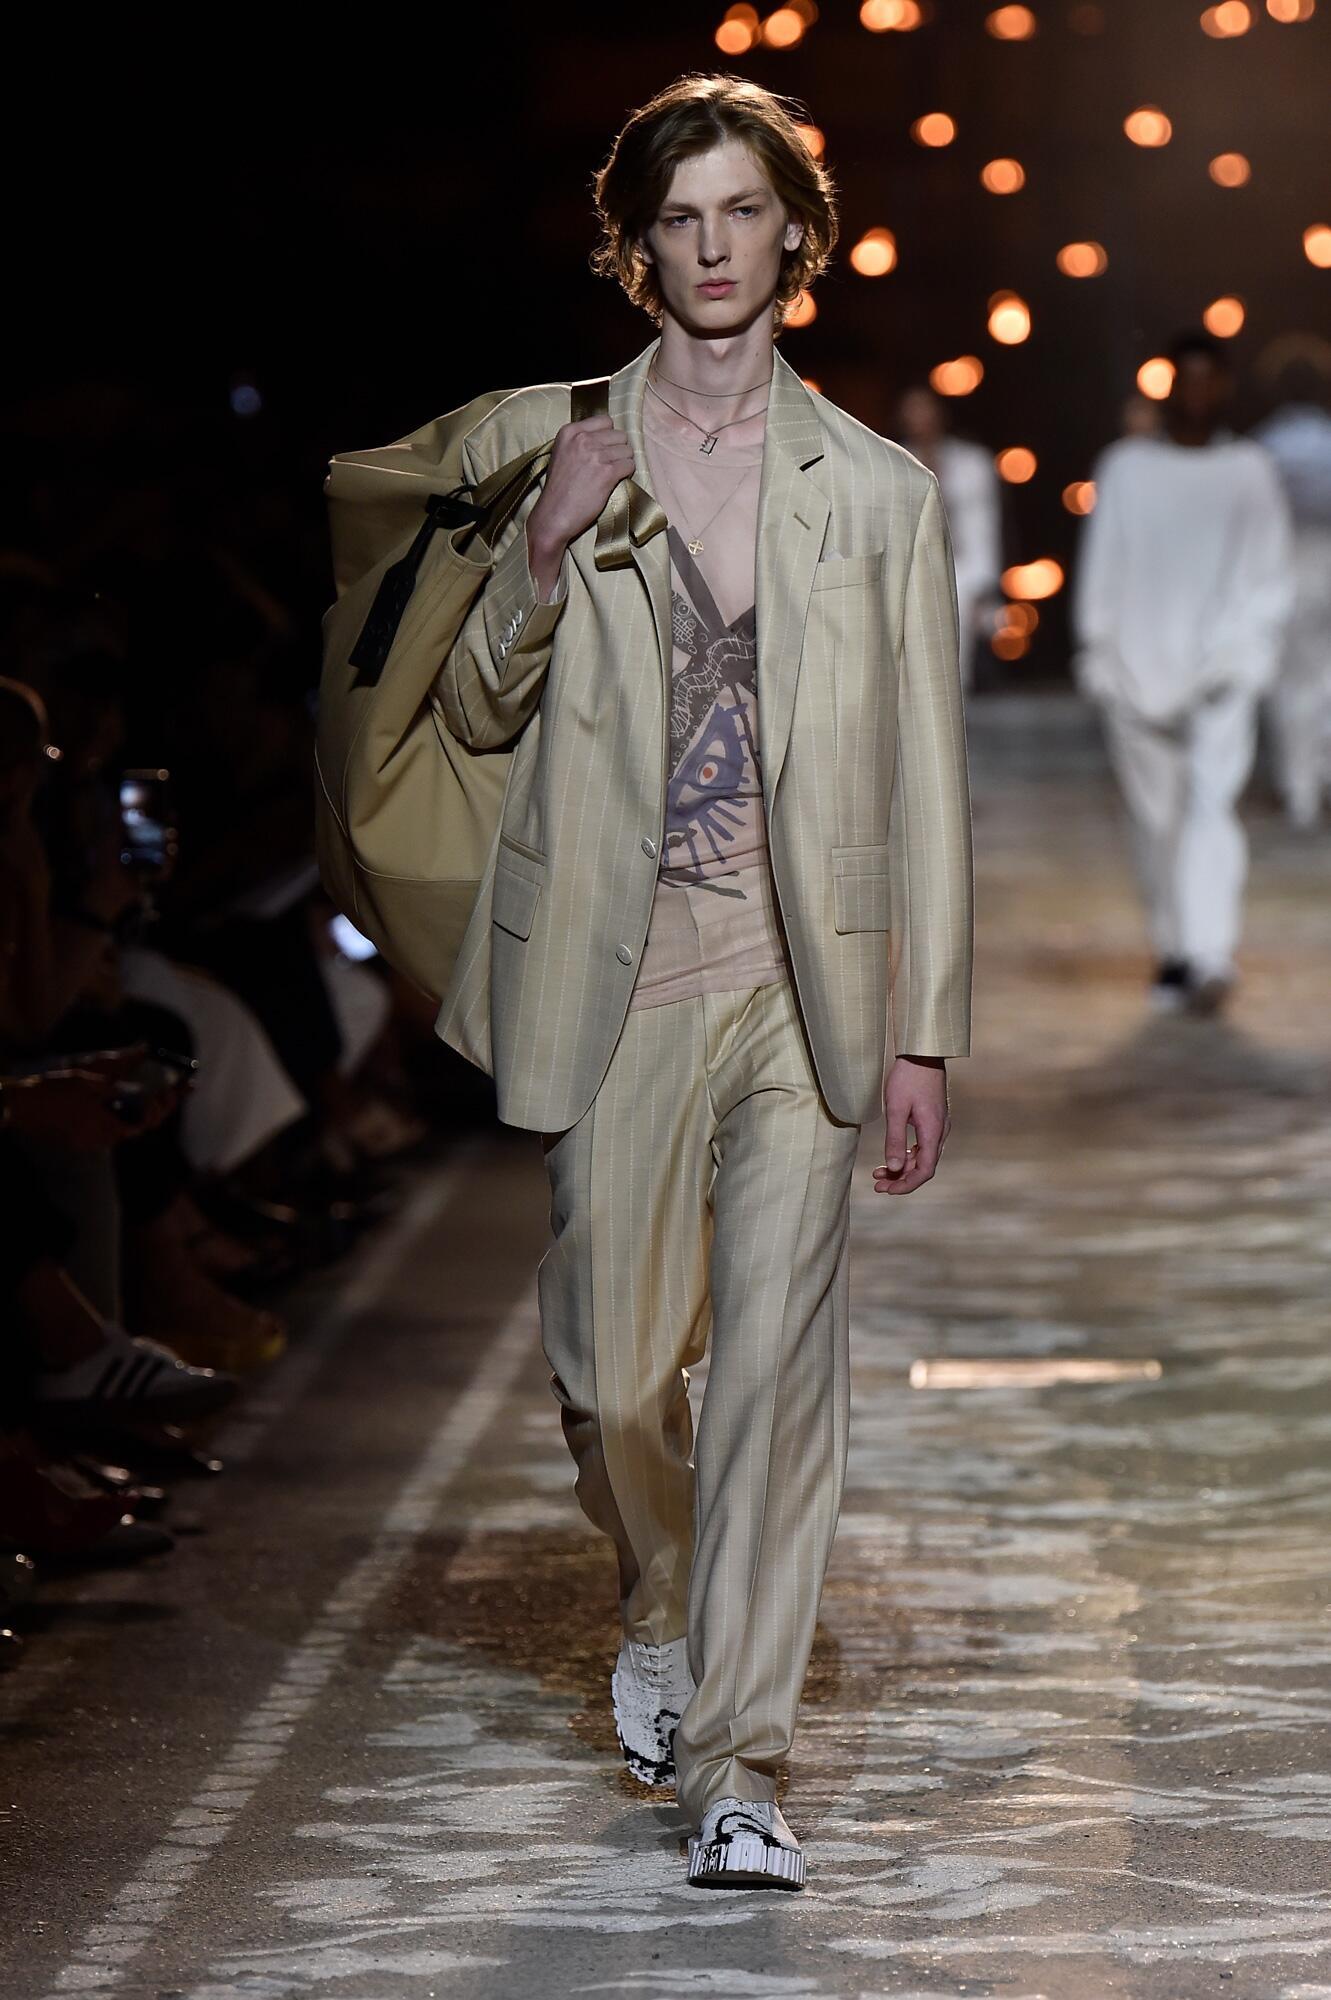 Hugo SS 2018 Menswear